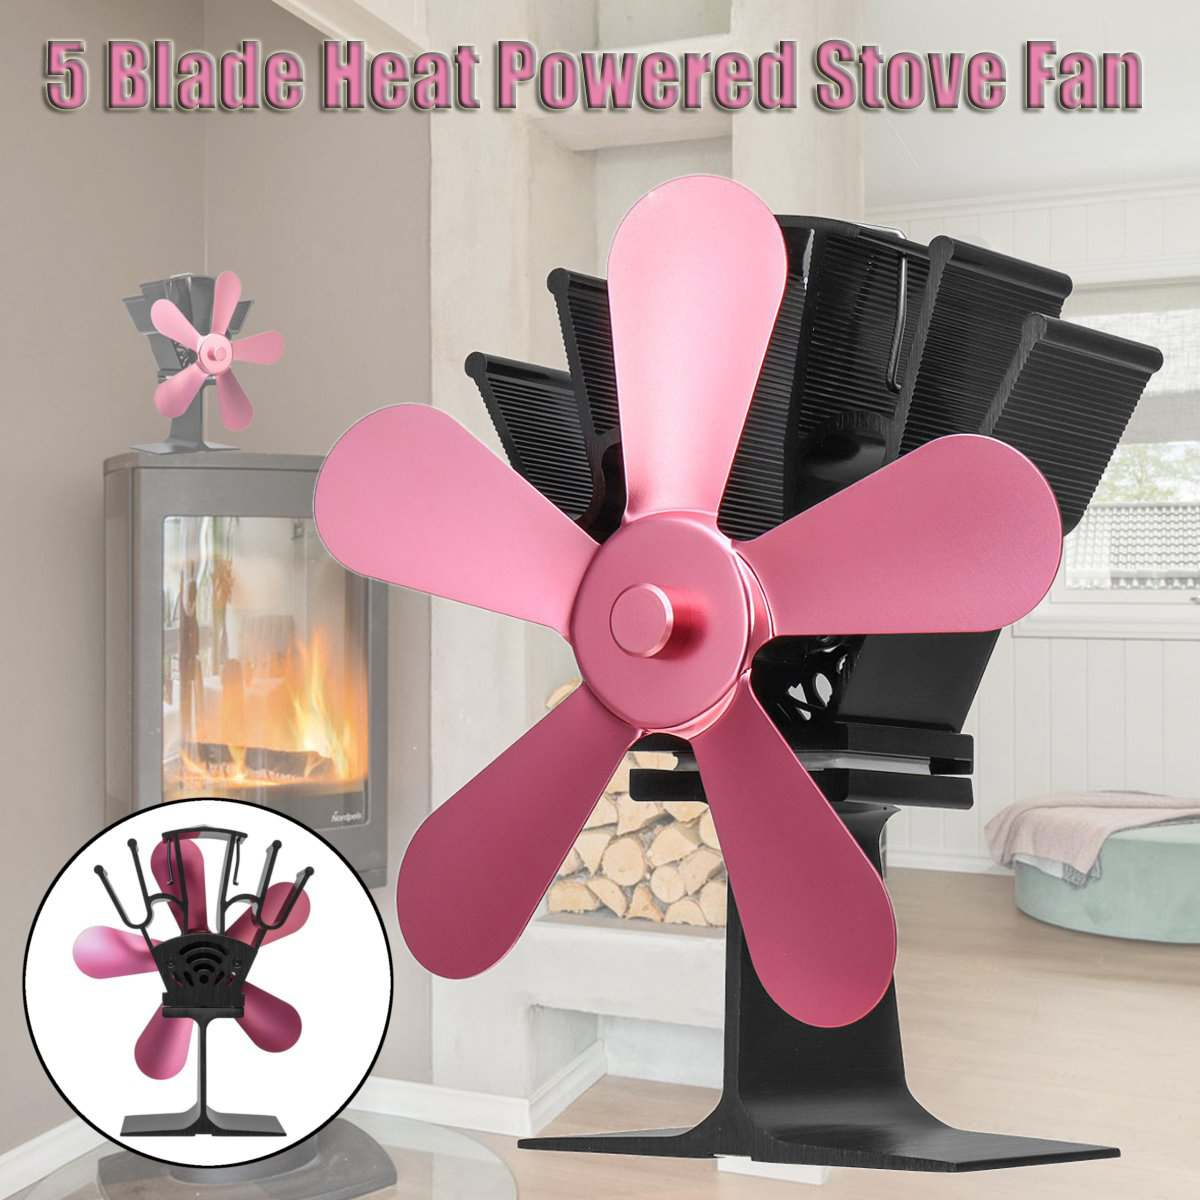 5 Blades Heat Powered Stove Fan Log Wood Burner Ecological fan Quiet Home Fireplace Fan Efficient Heat Distribution